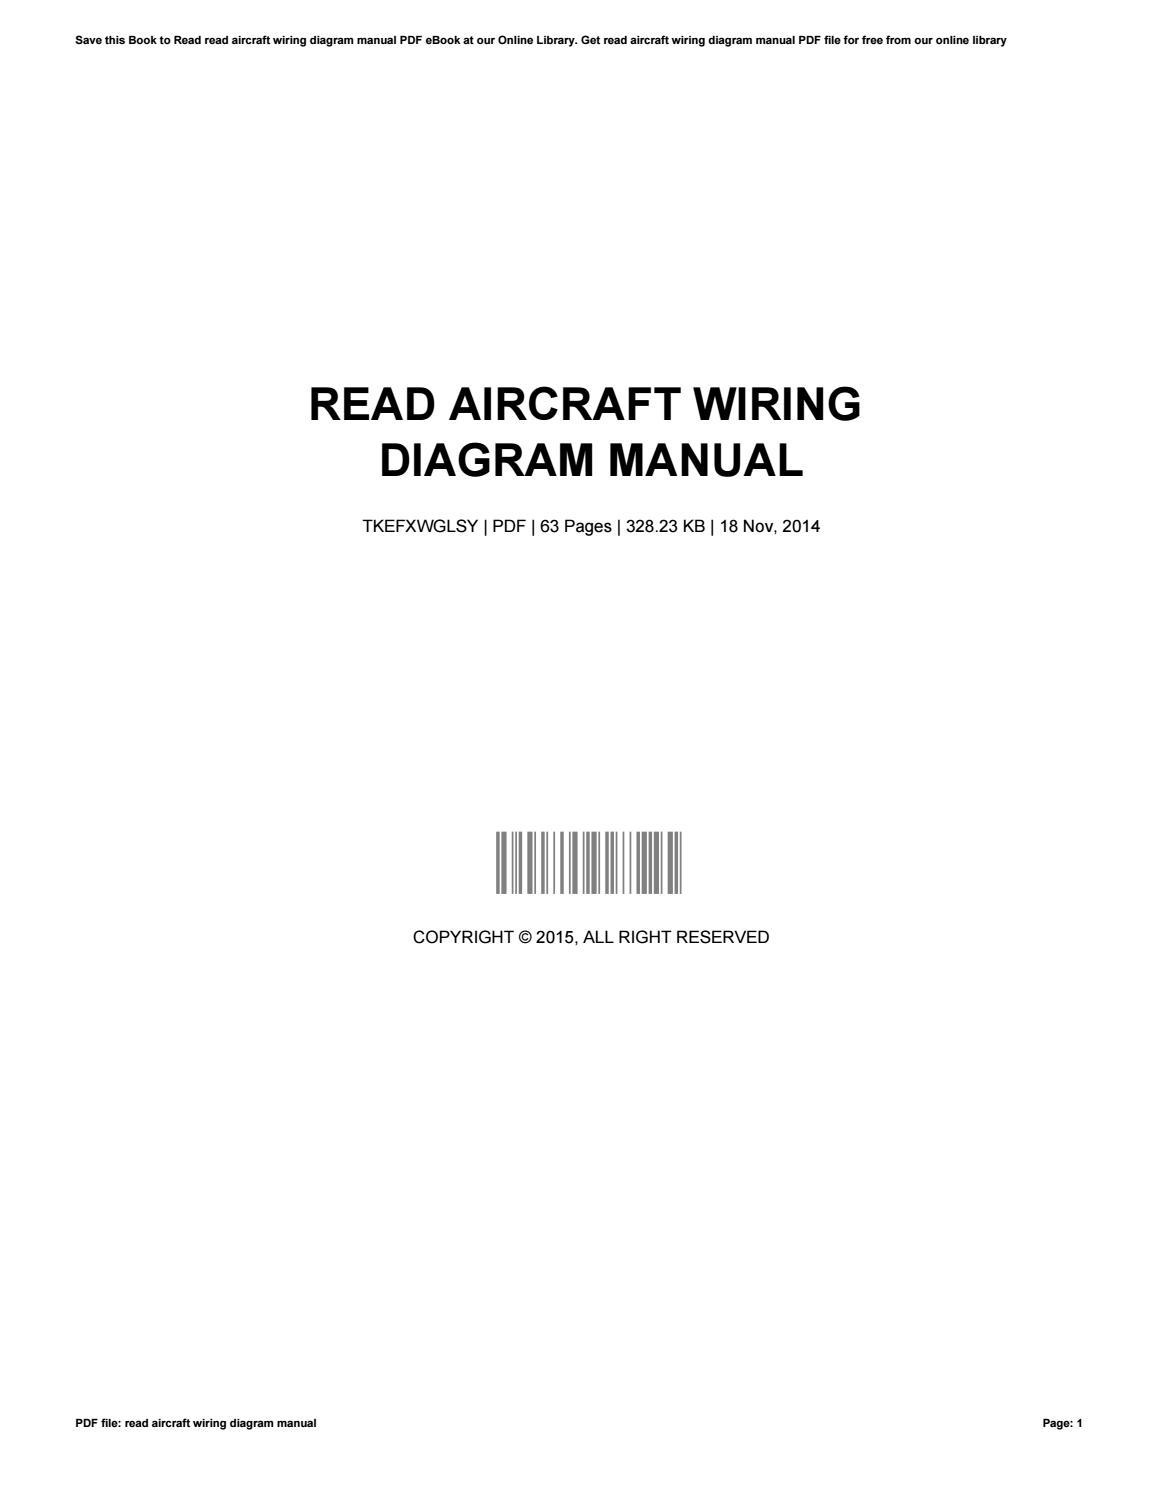 hight resolution of aircraft wiring diagram manual